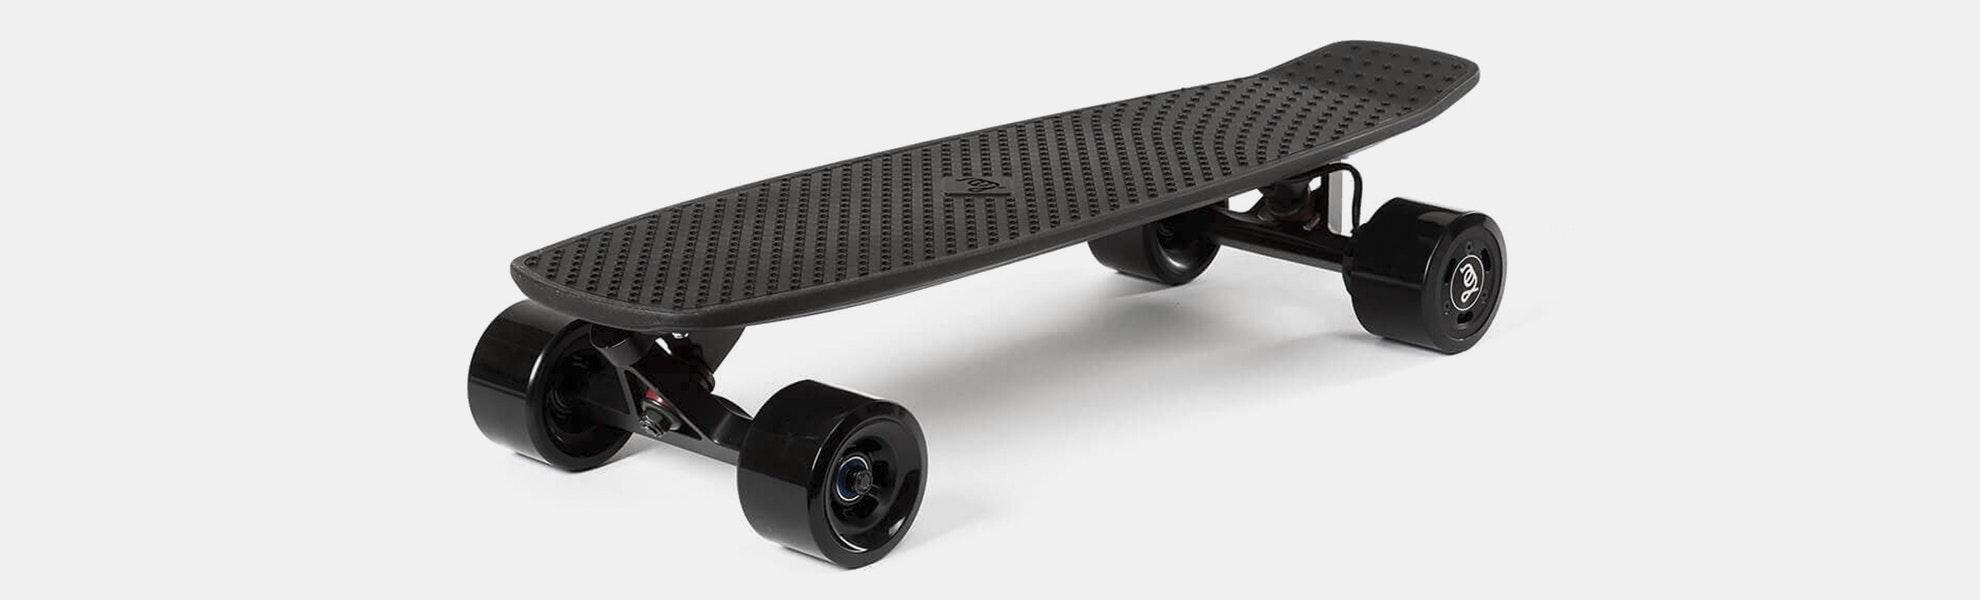 Lou Board 1.0 Electric Skateboard